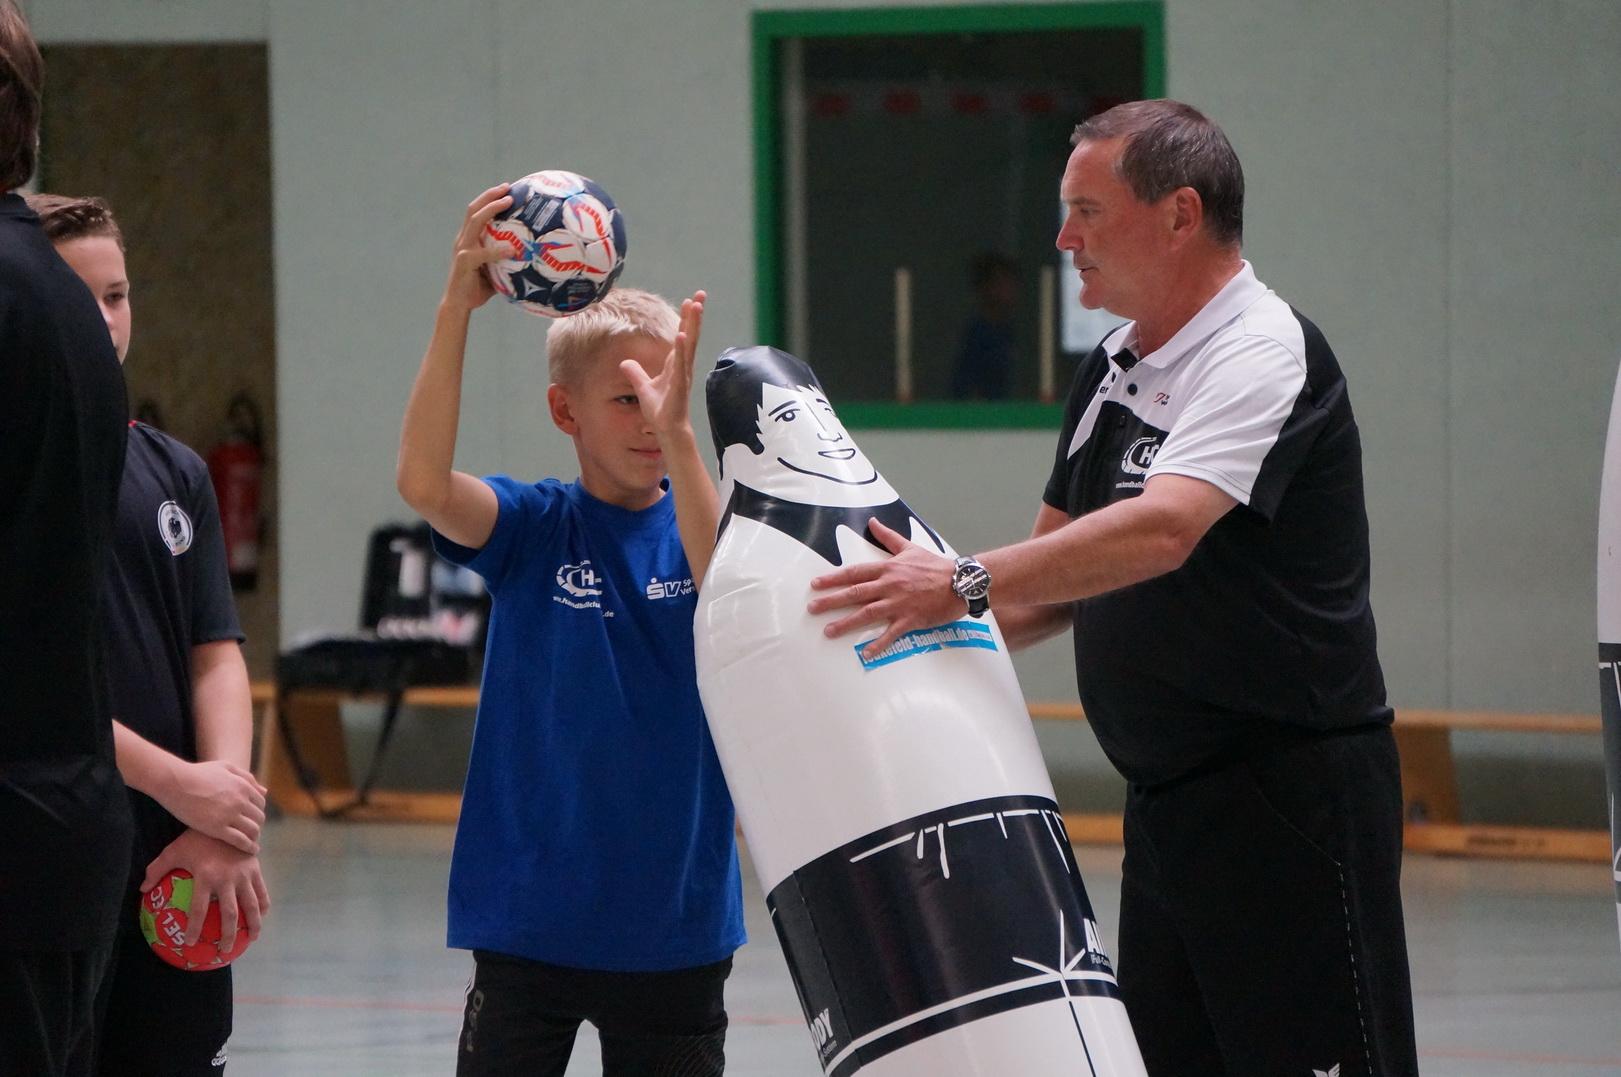 201808_Handballcamp_SDH_MG_212w